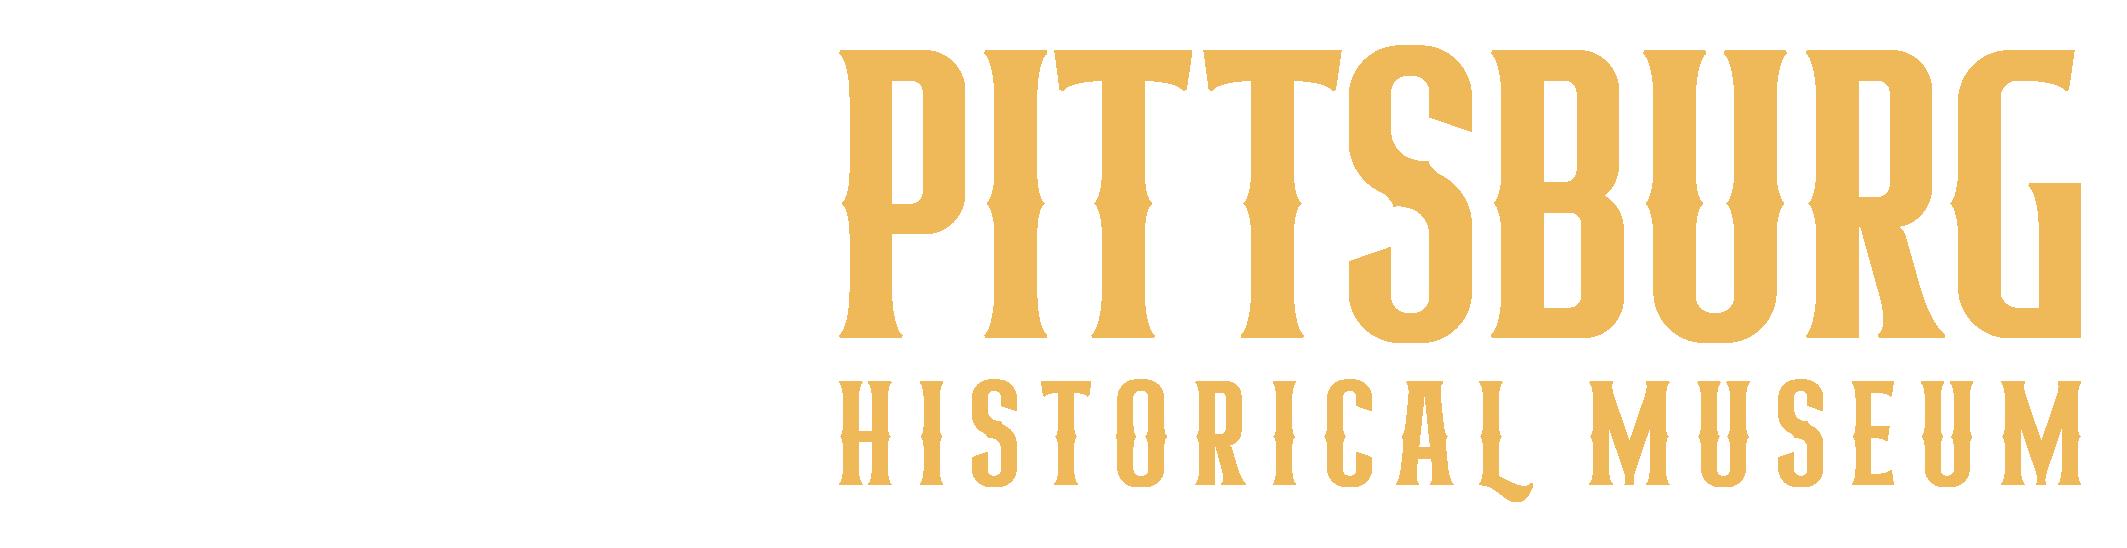 Pittsburg Historical Museum logo